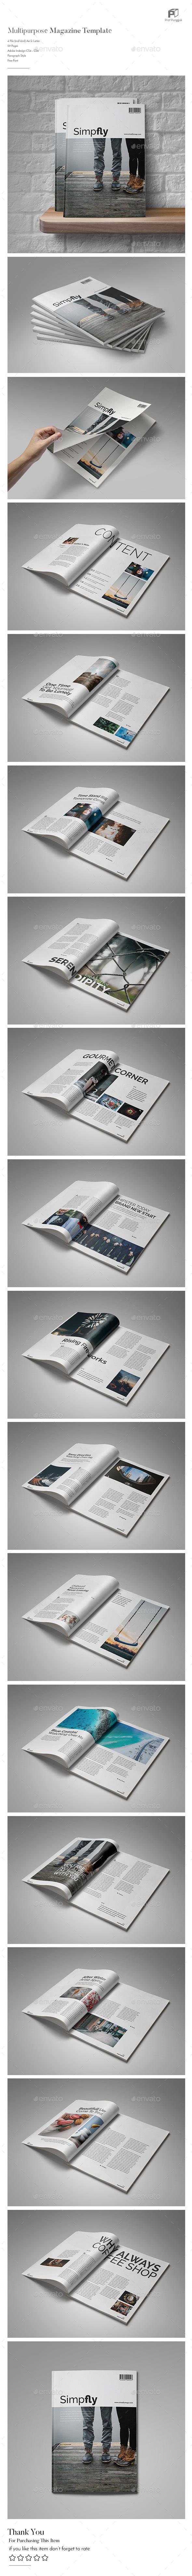 Clean & Simple Magazine Vol.5 - Magazines Print Templates